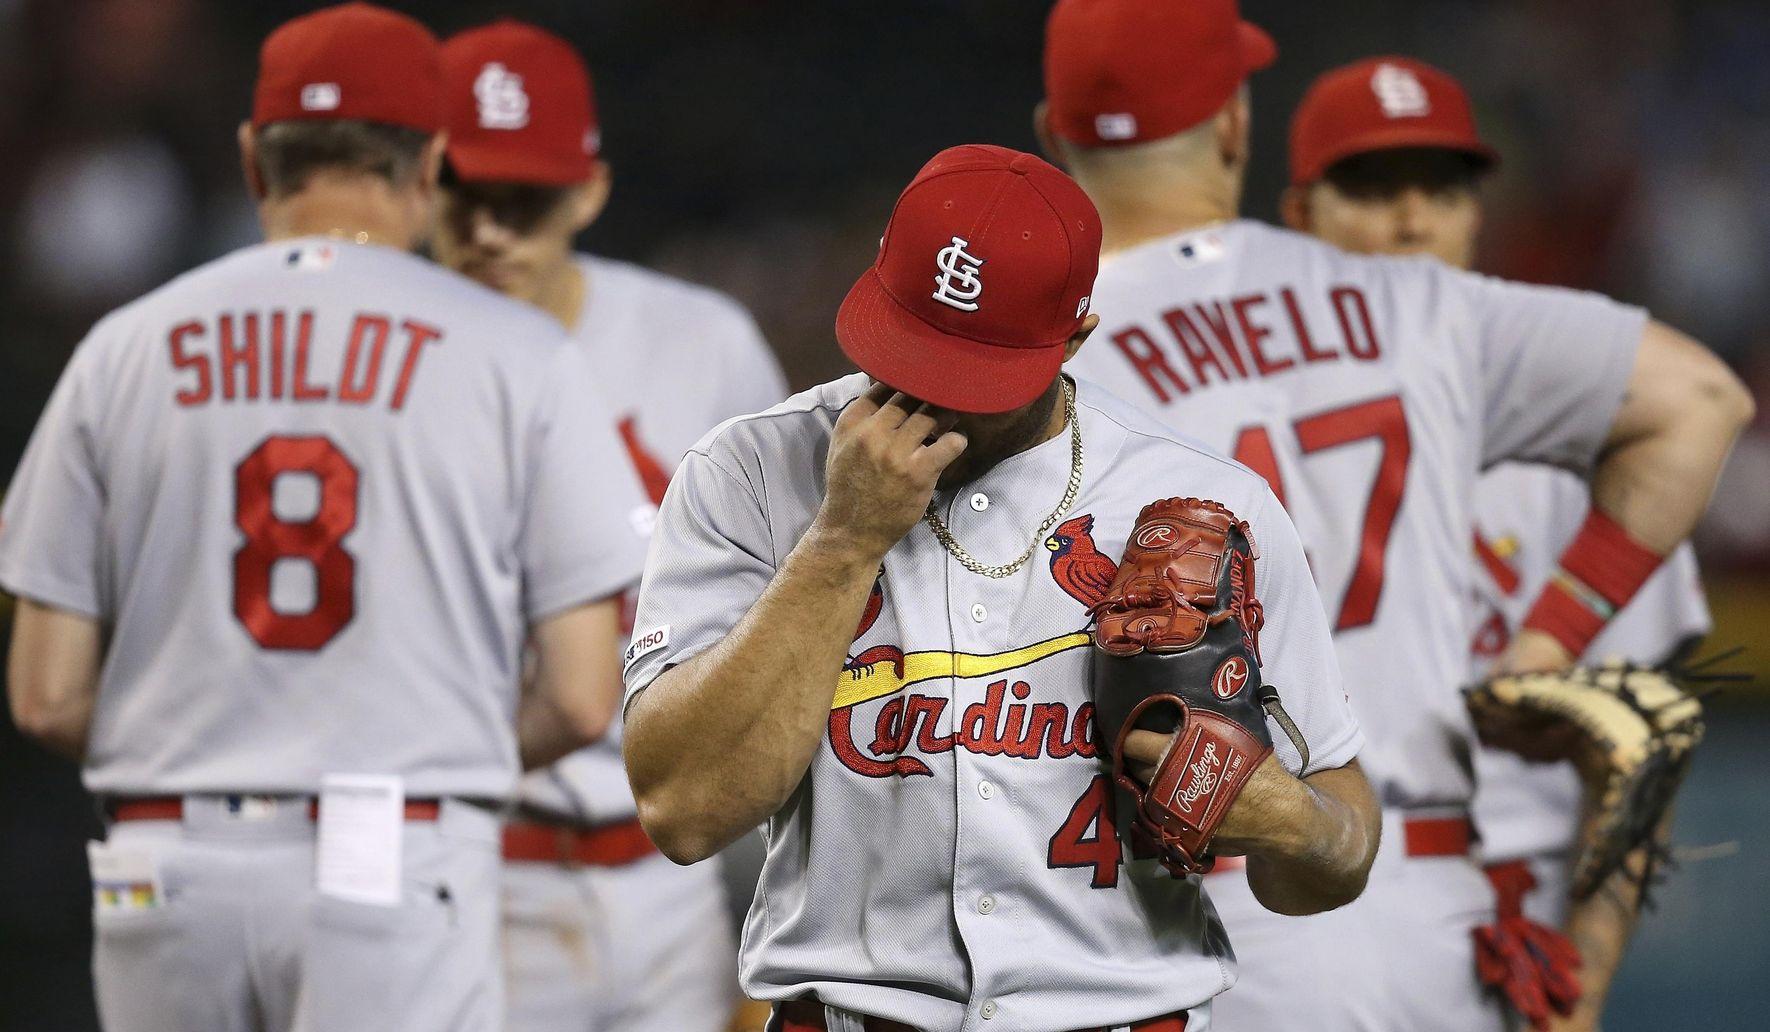 Cardinals_diamondbacks_baseball_33379_c0-151-3600-2249_s1770x1032